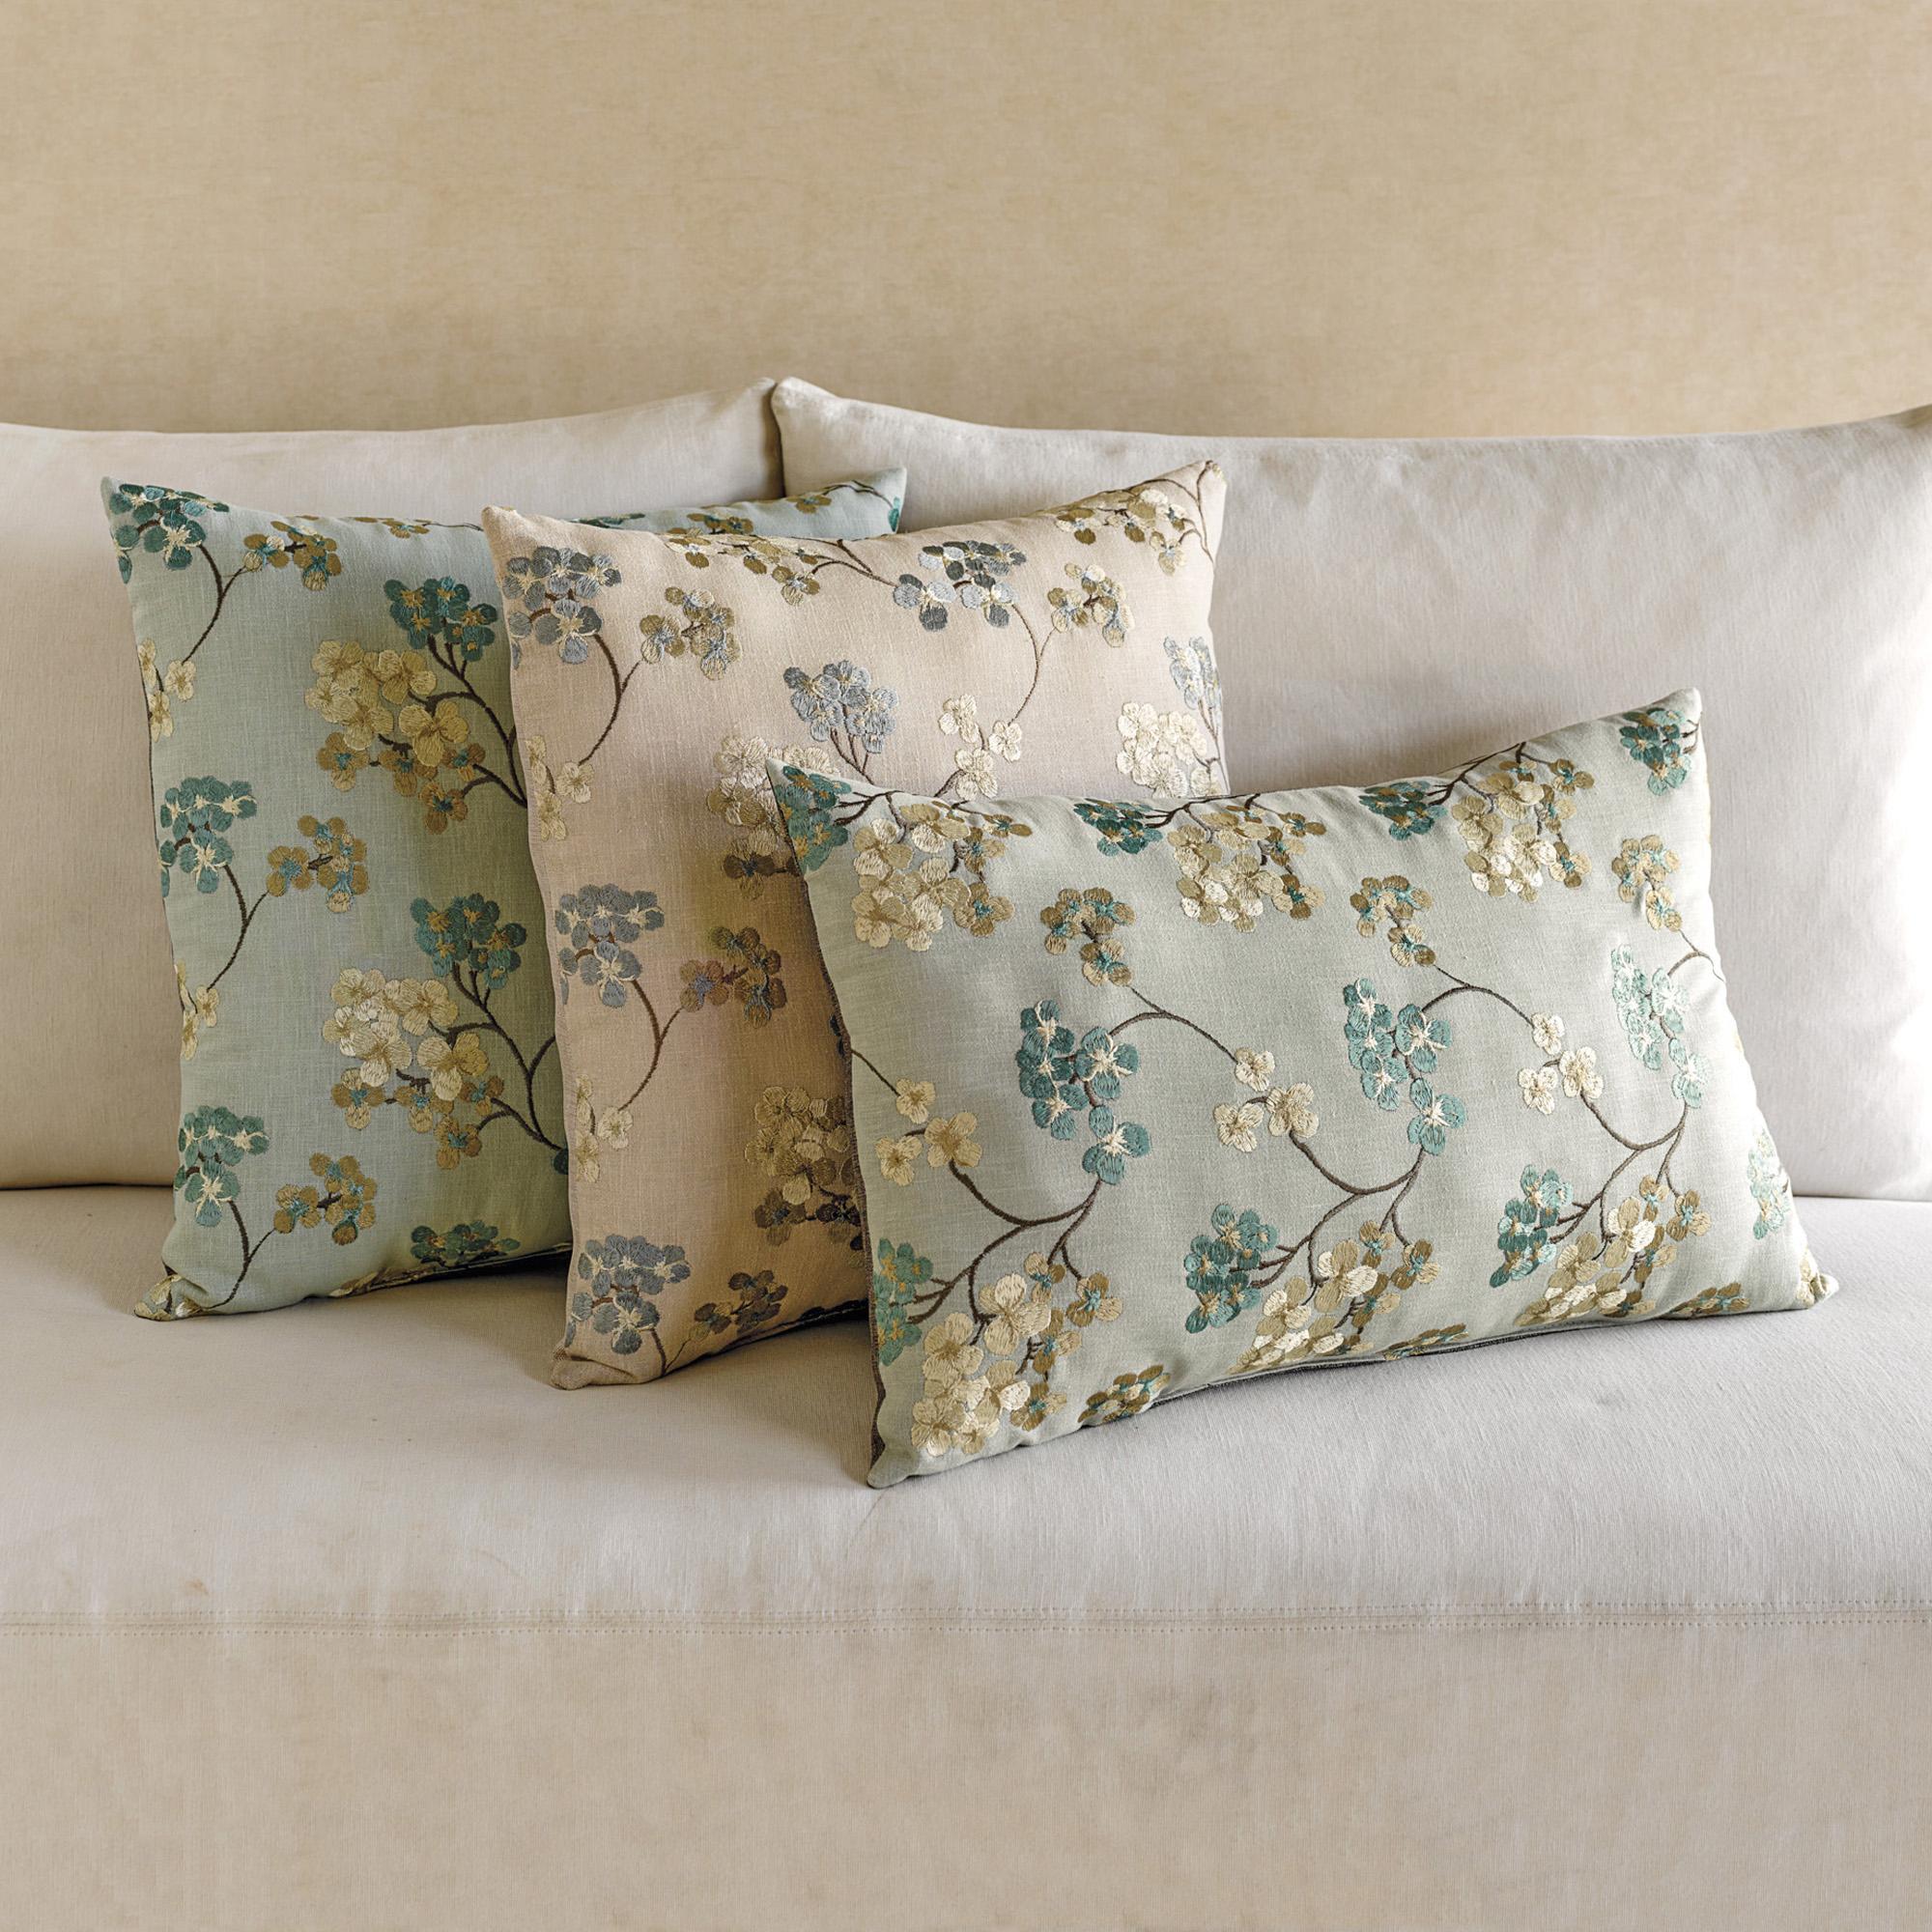 Throw Pillows Home : Bloomsbury Pillows Gump s